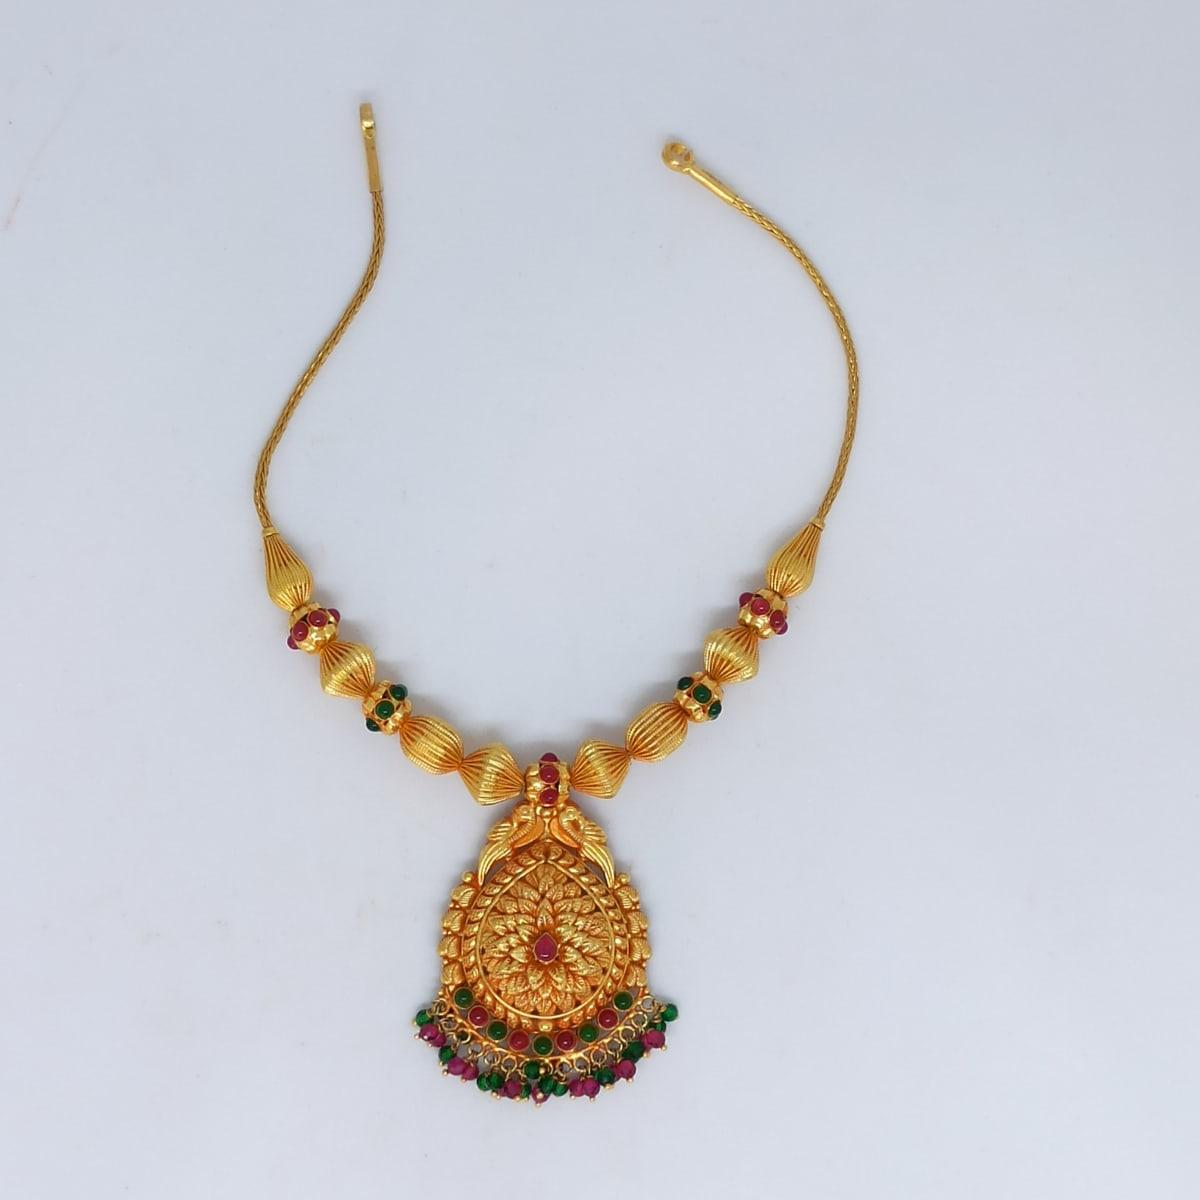 Vina Antique Necklace For Her